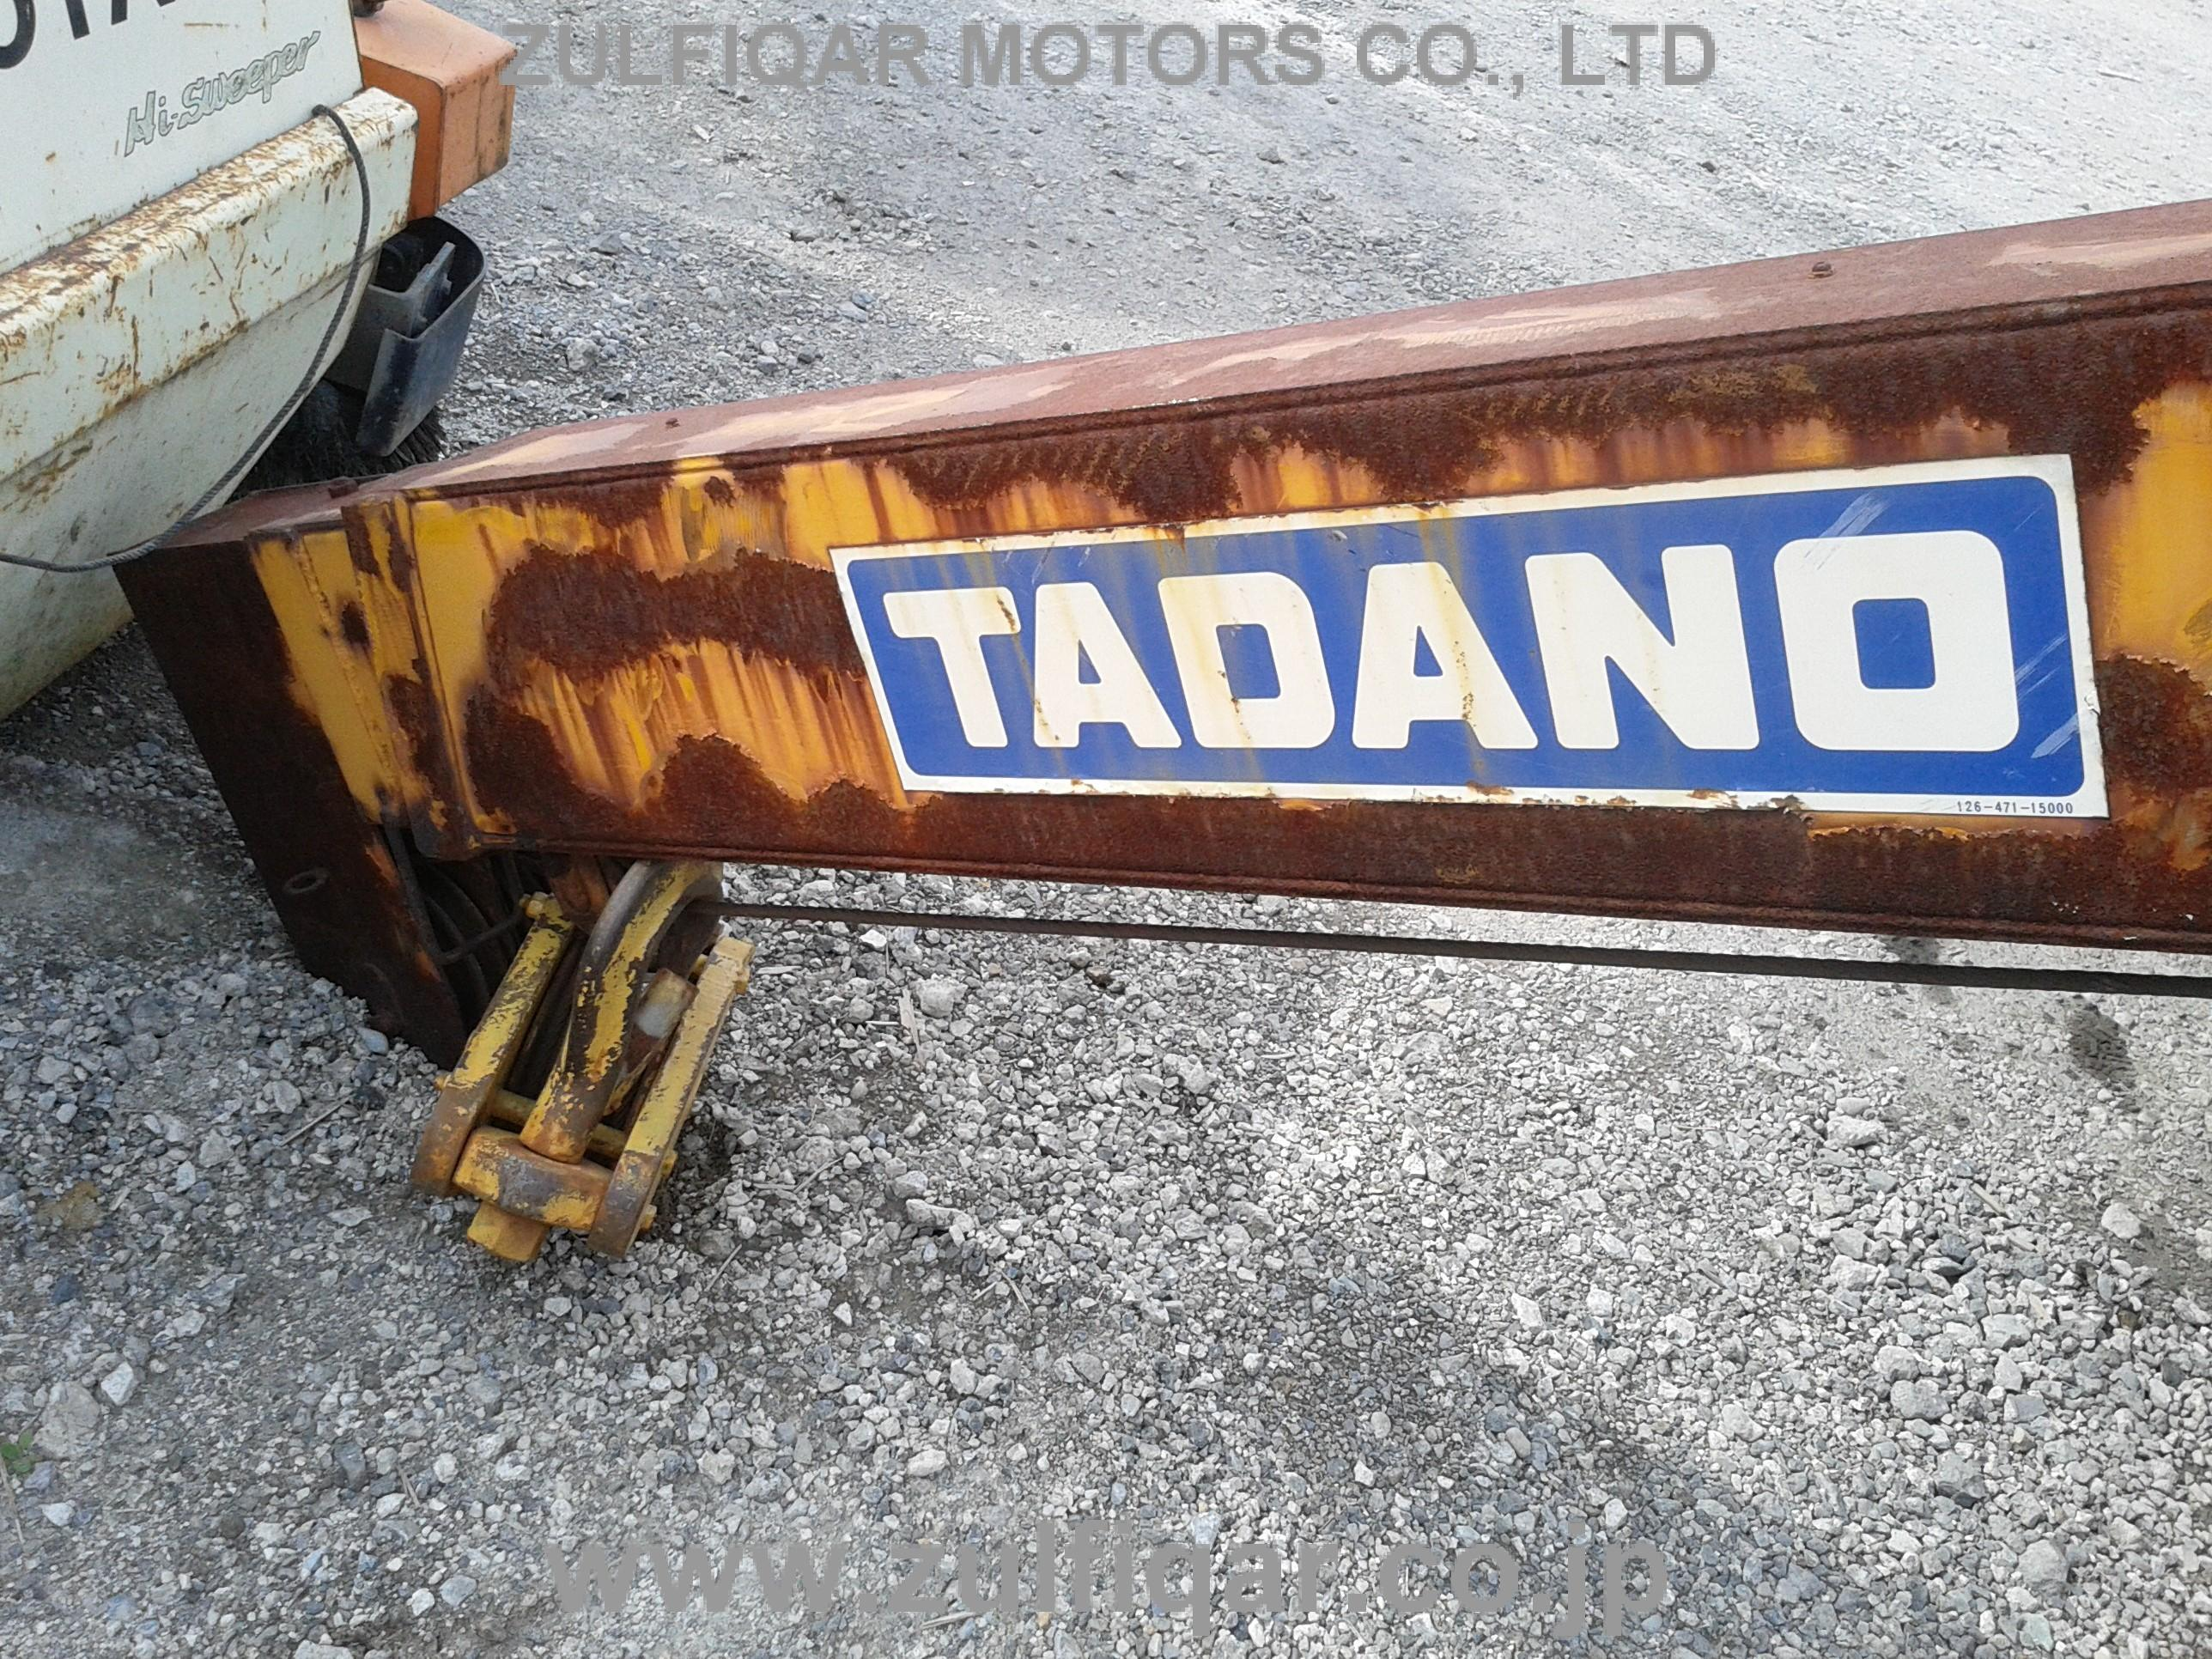 TADANO CRANE 1990 Image 7